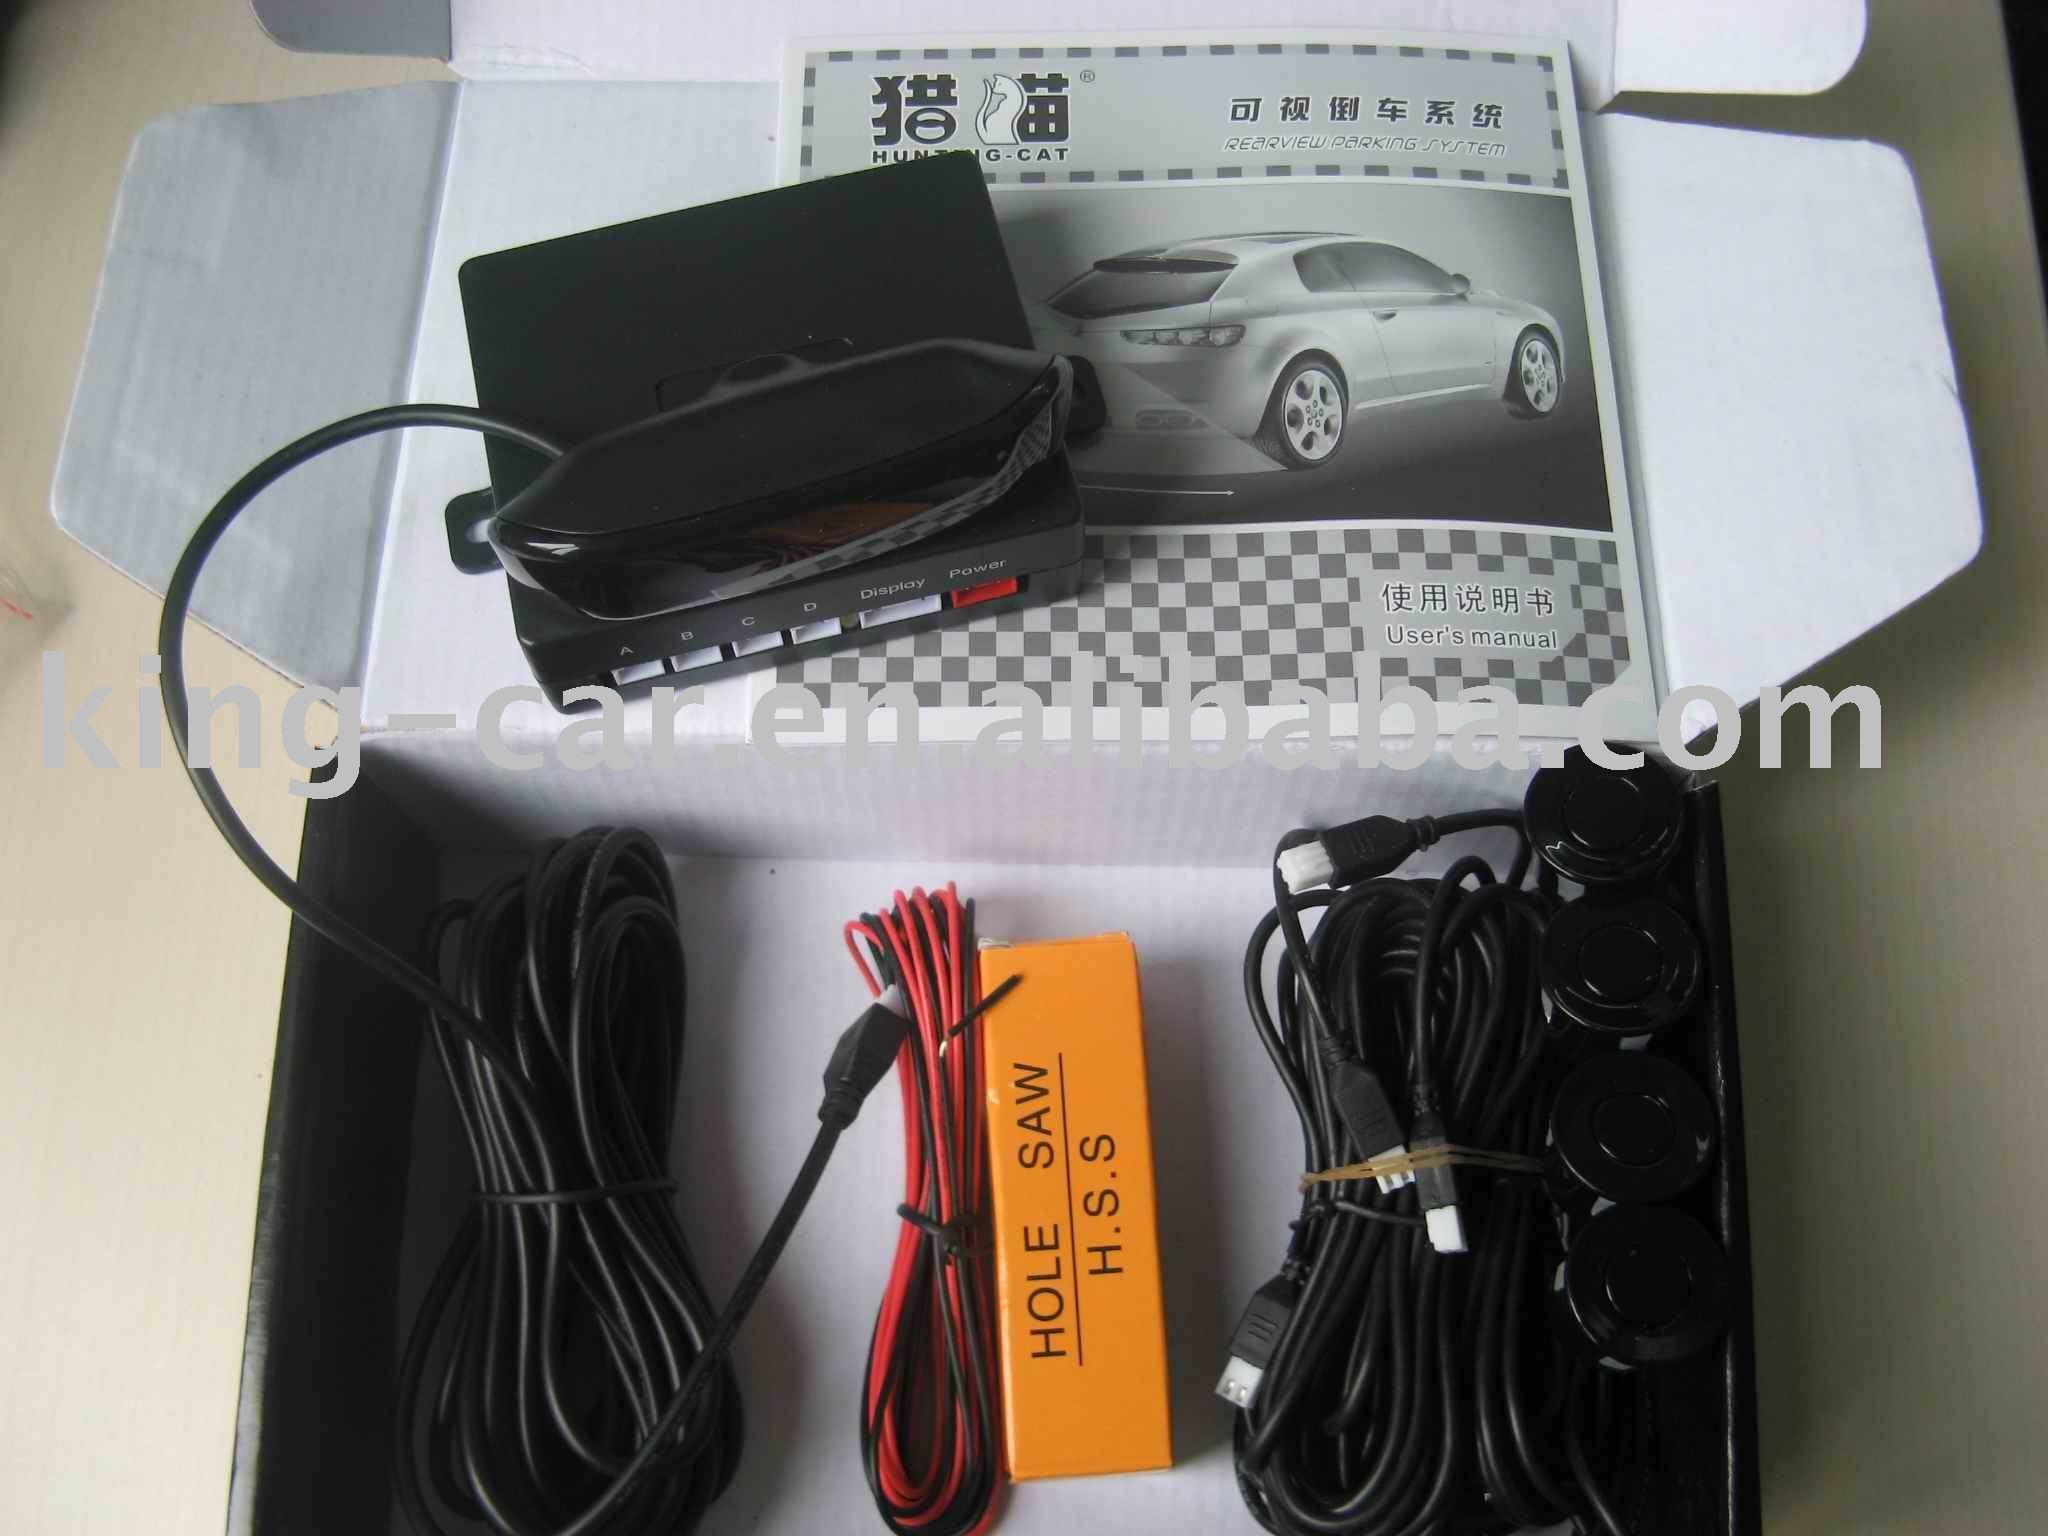 brand new 12Voltage ultrasonic waterproof reverse sensor buzzer alart LED display car parking sensor PS-848(China (Mainland))